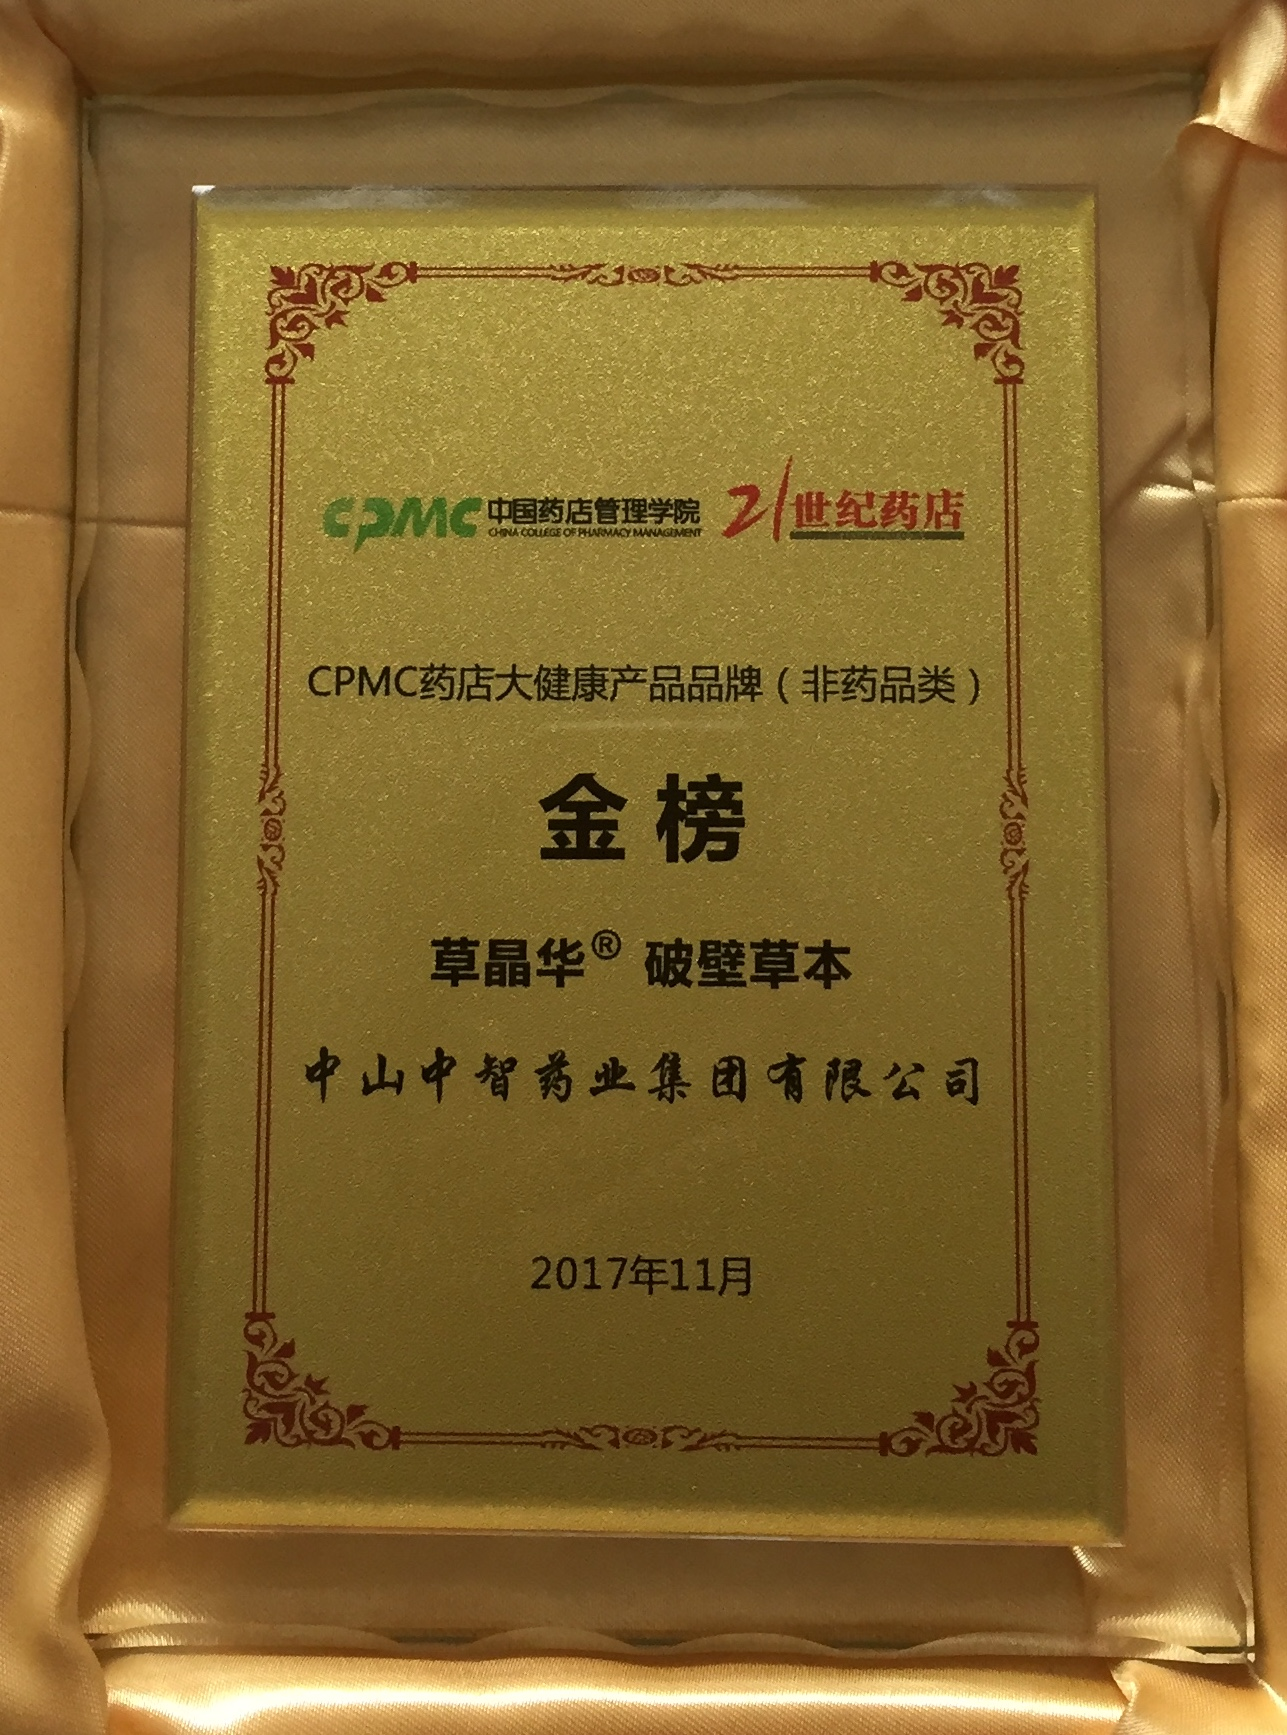 C端聚势,草晶华荣登CPMC药店大健康产品品牌金榜